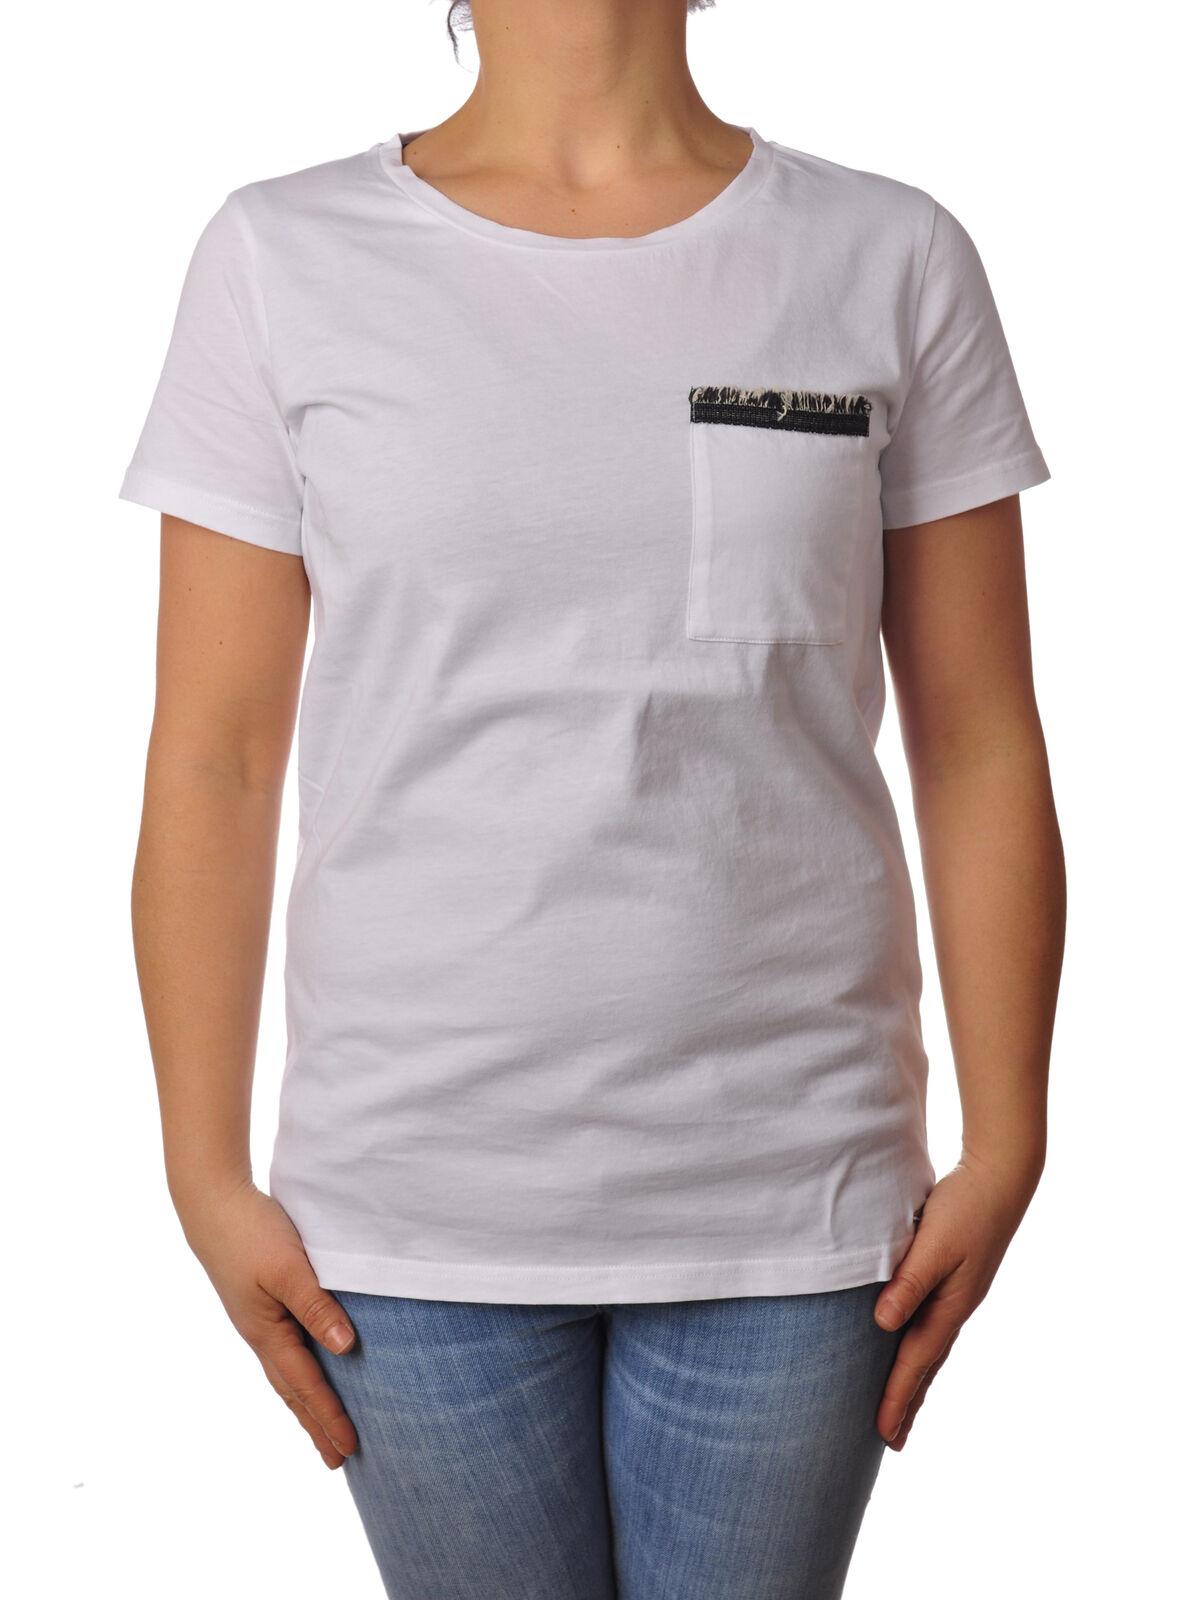 Woolrich - Topwear-T-shirts - Woman - Weiß - 4982715G180824